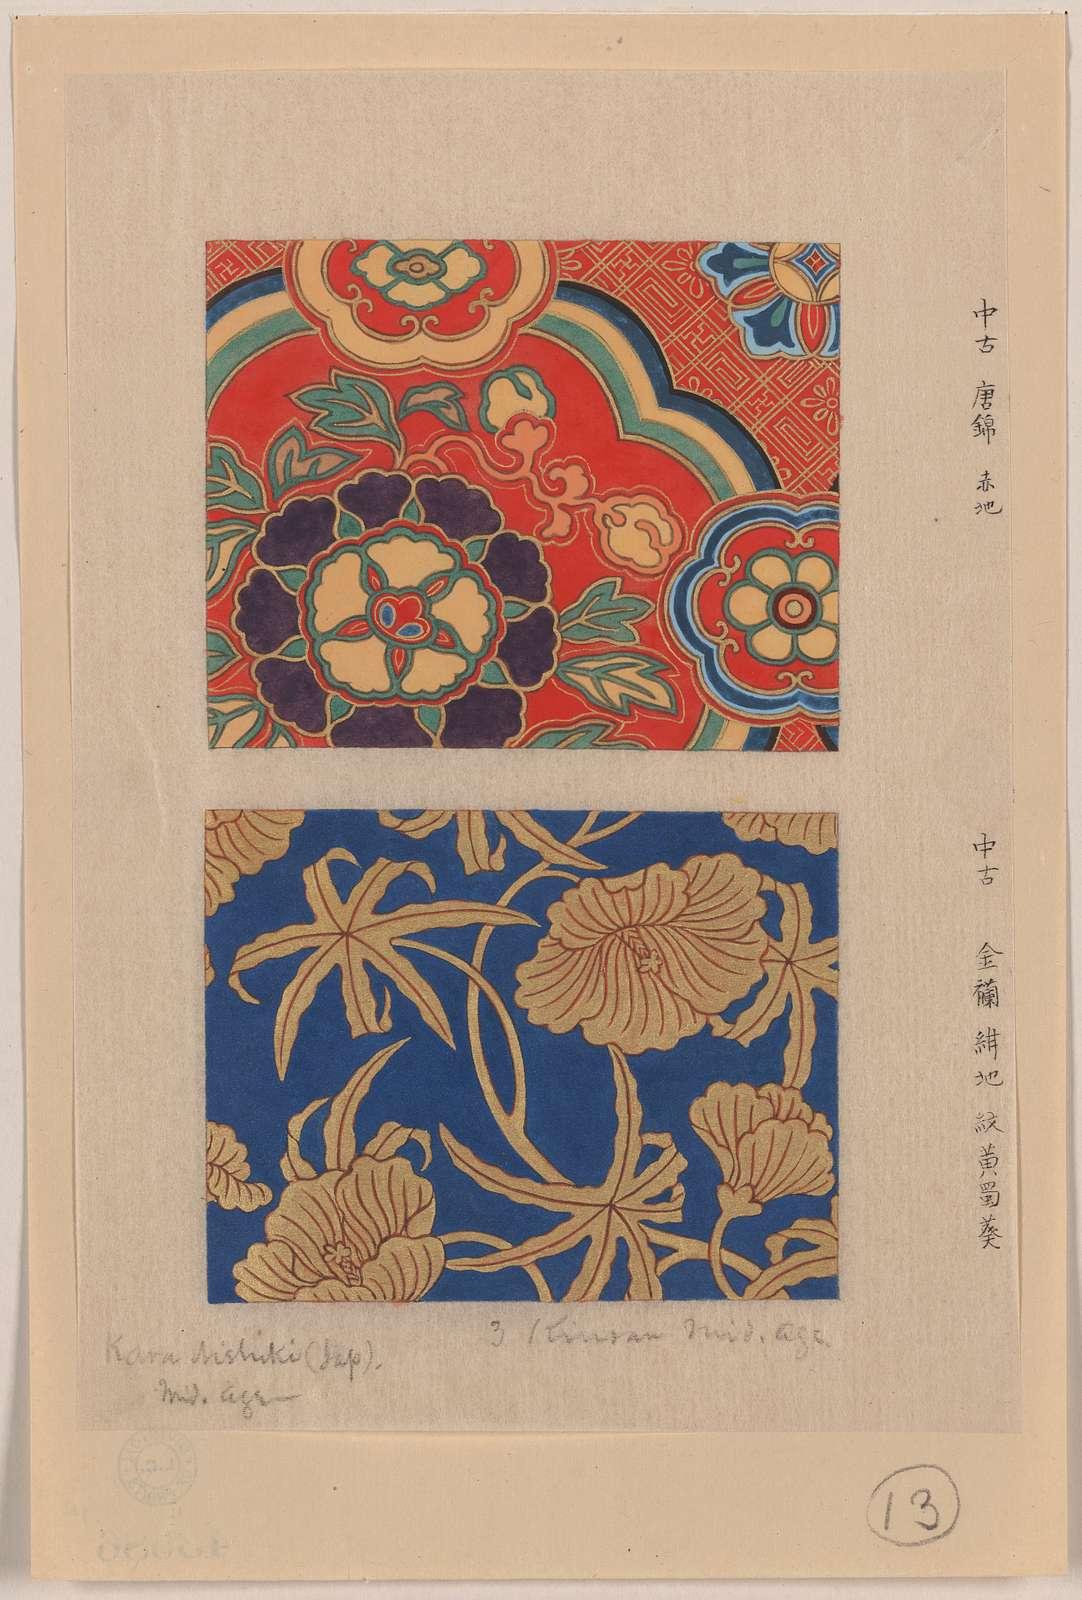 [Kara nishiki (Chinese brocade) with red background] [Kinran (gold brocade) with hollyhock on blue background].